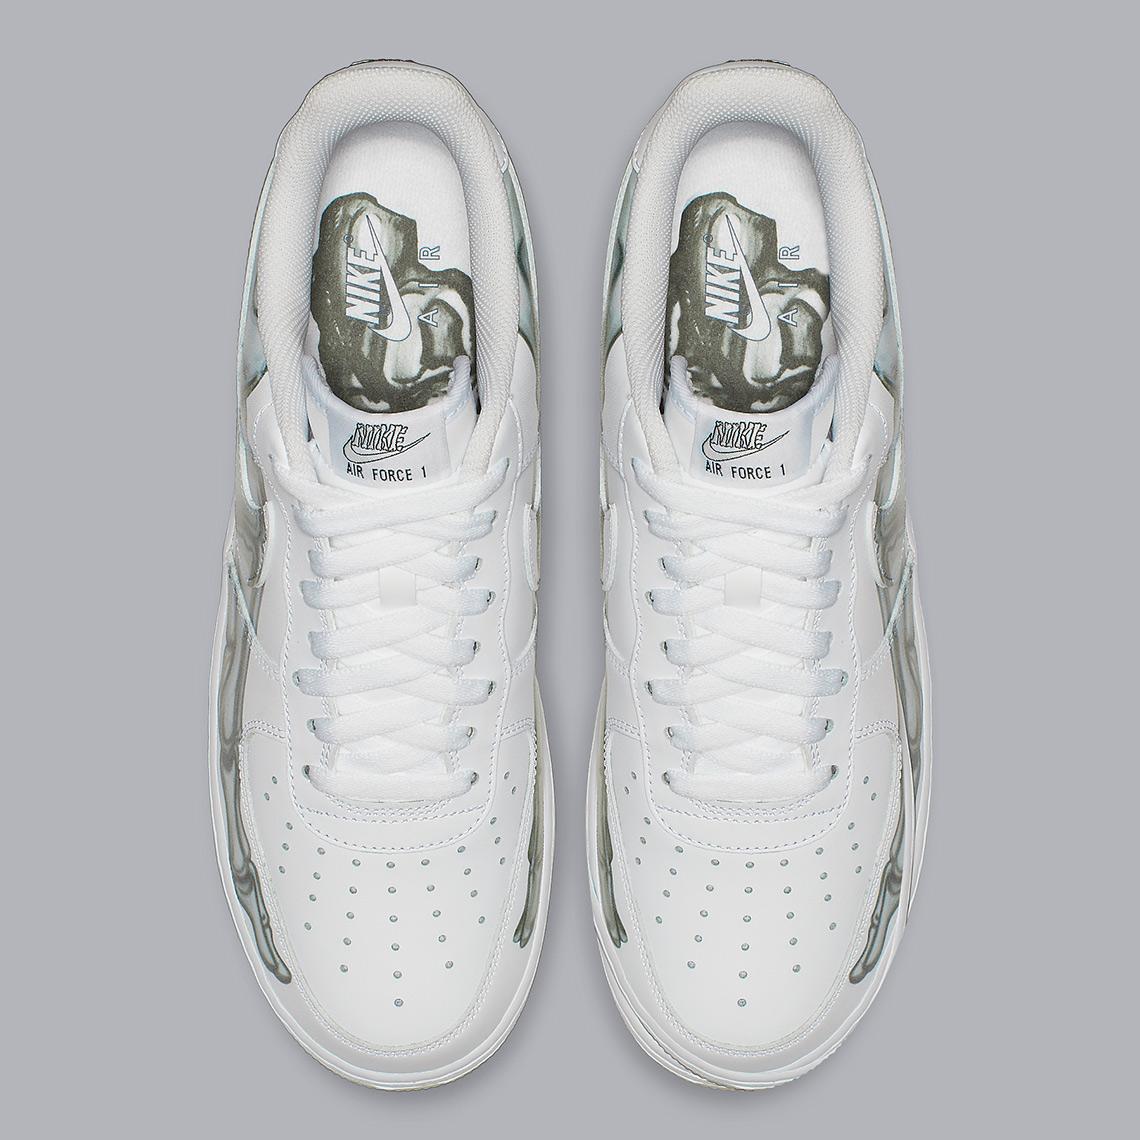 huge selection of dde46 0346f Nike Air Force 1 Low Skeleton BQ7541-100 Store List ...